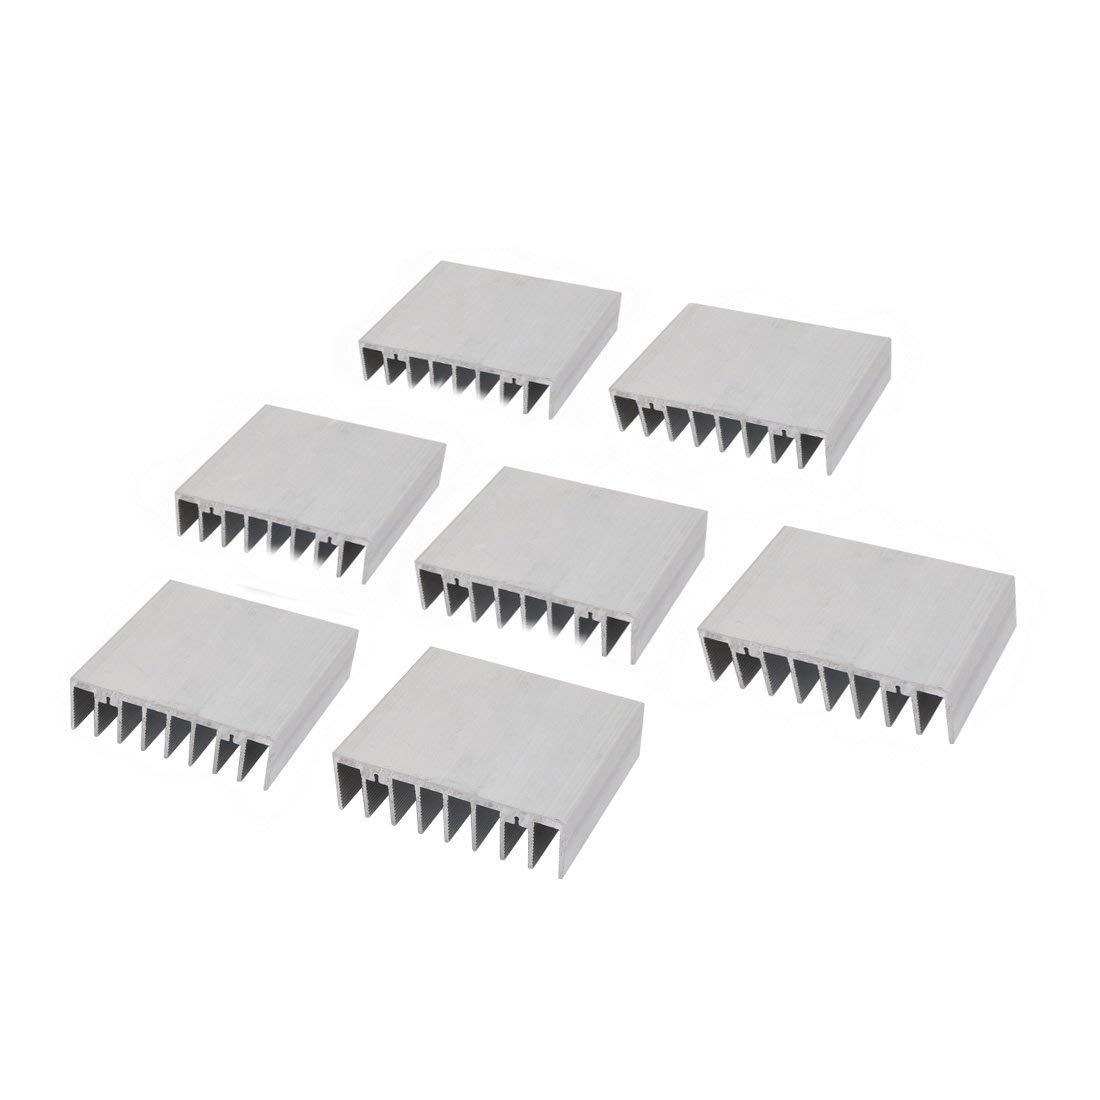 uxcell 5Pcs Heat Diffuse Dissipation Chipset Aluminium Heatsink Cooling Fin 61mmx44mmx11mm